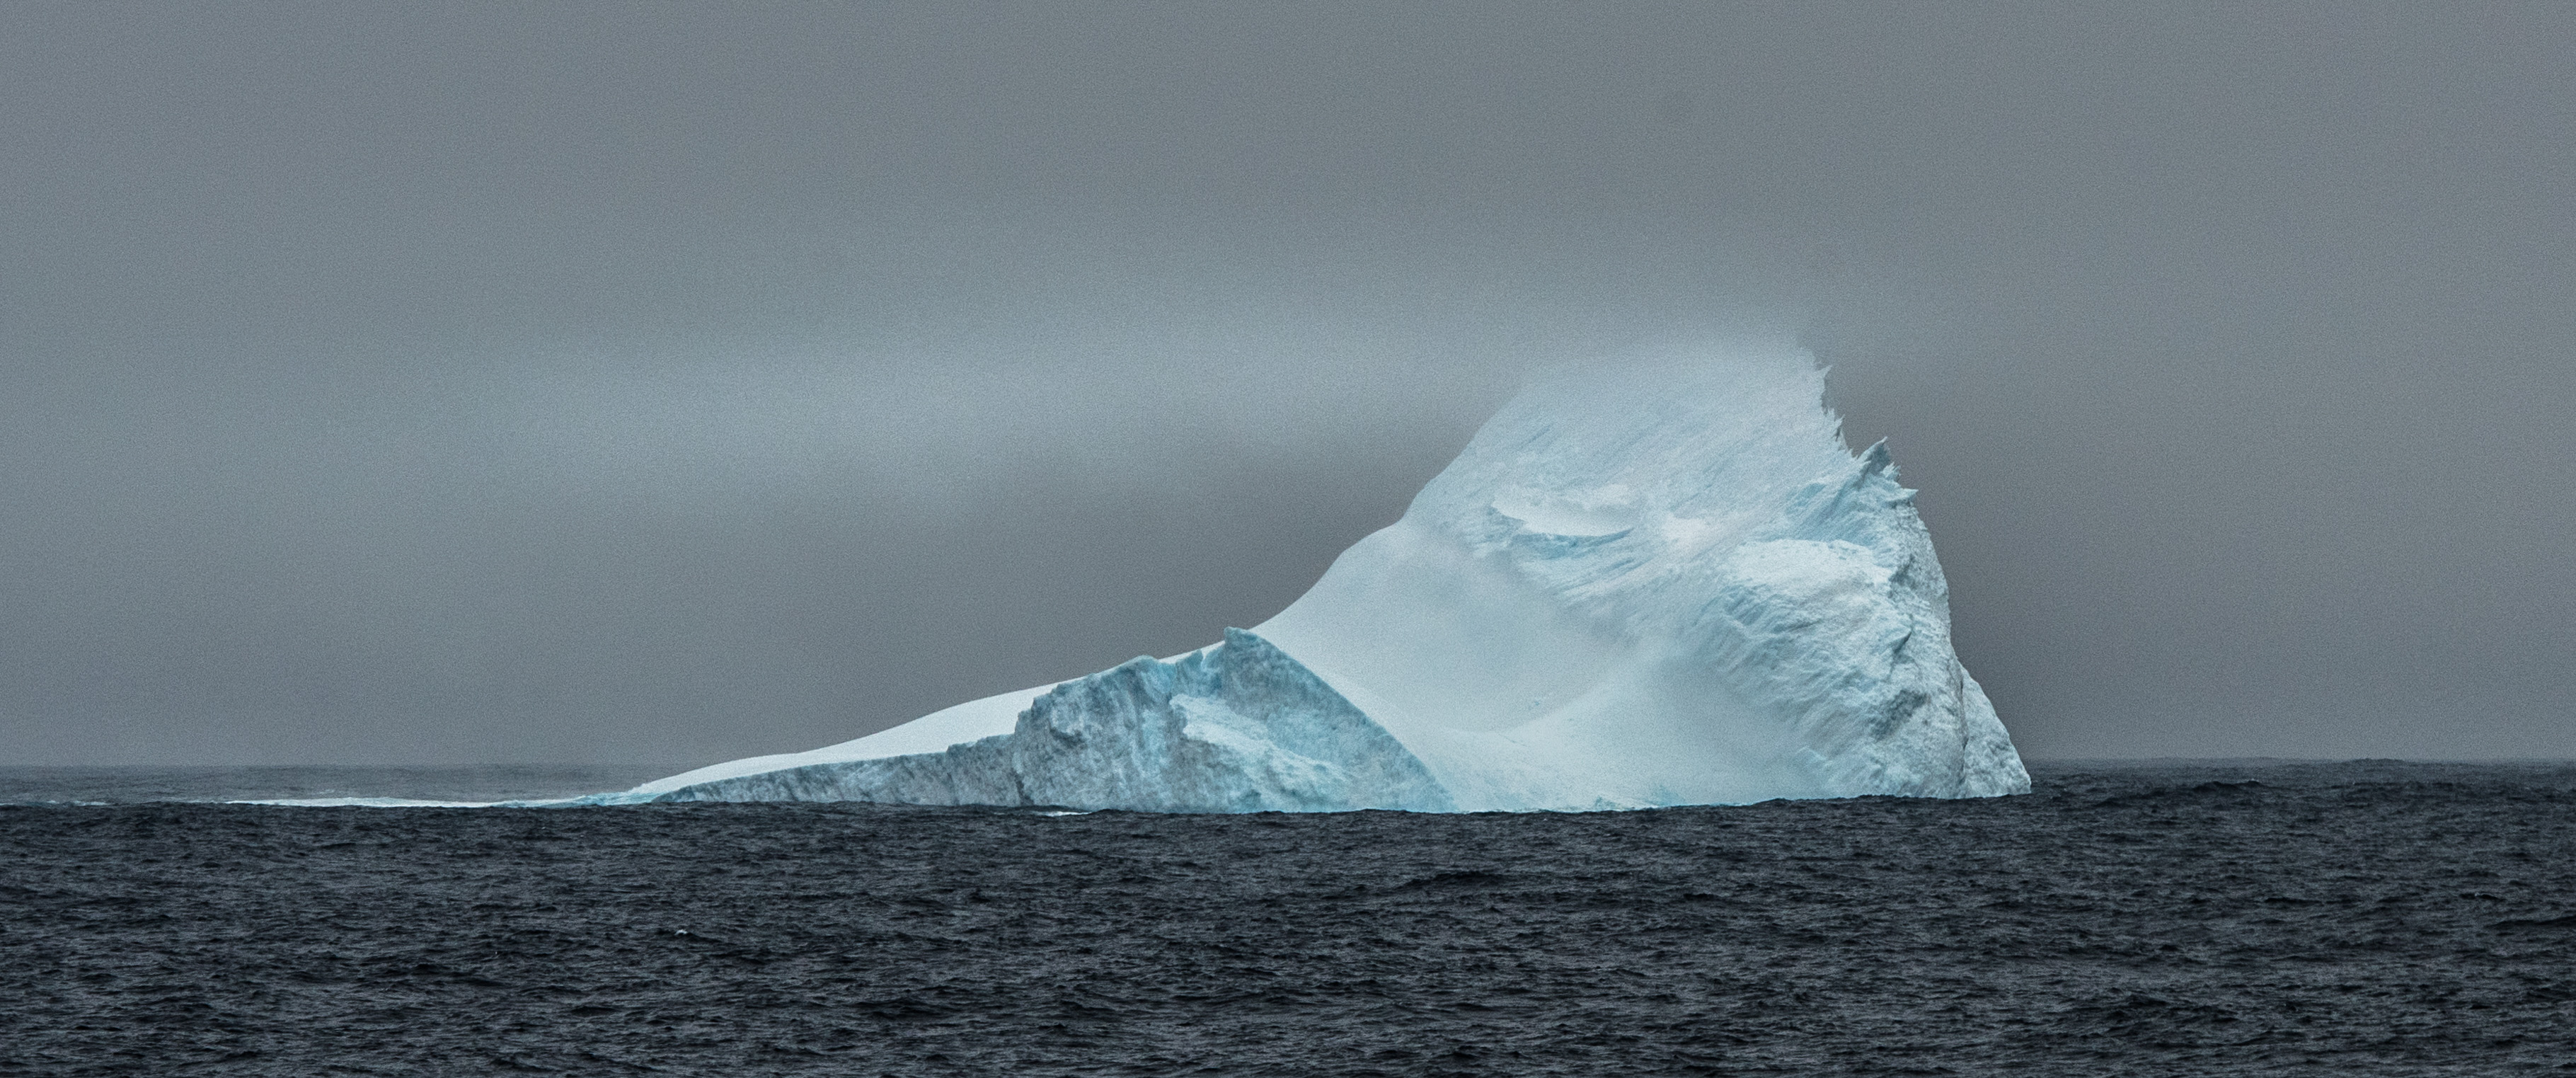 First Iceberg- Photo credits: JULIO_LANDMANN